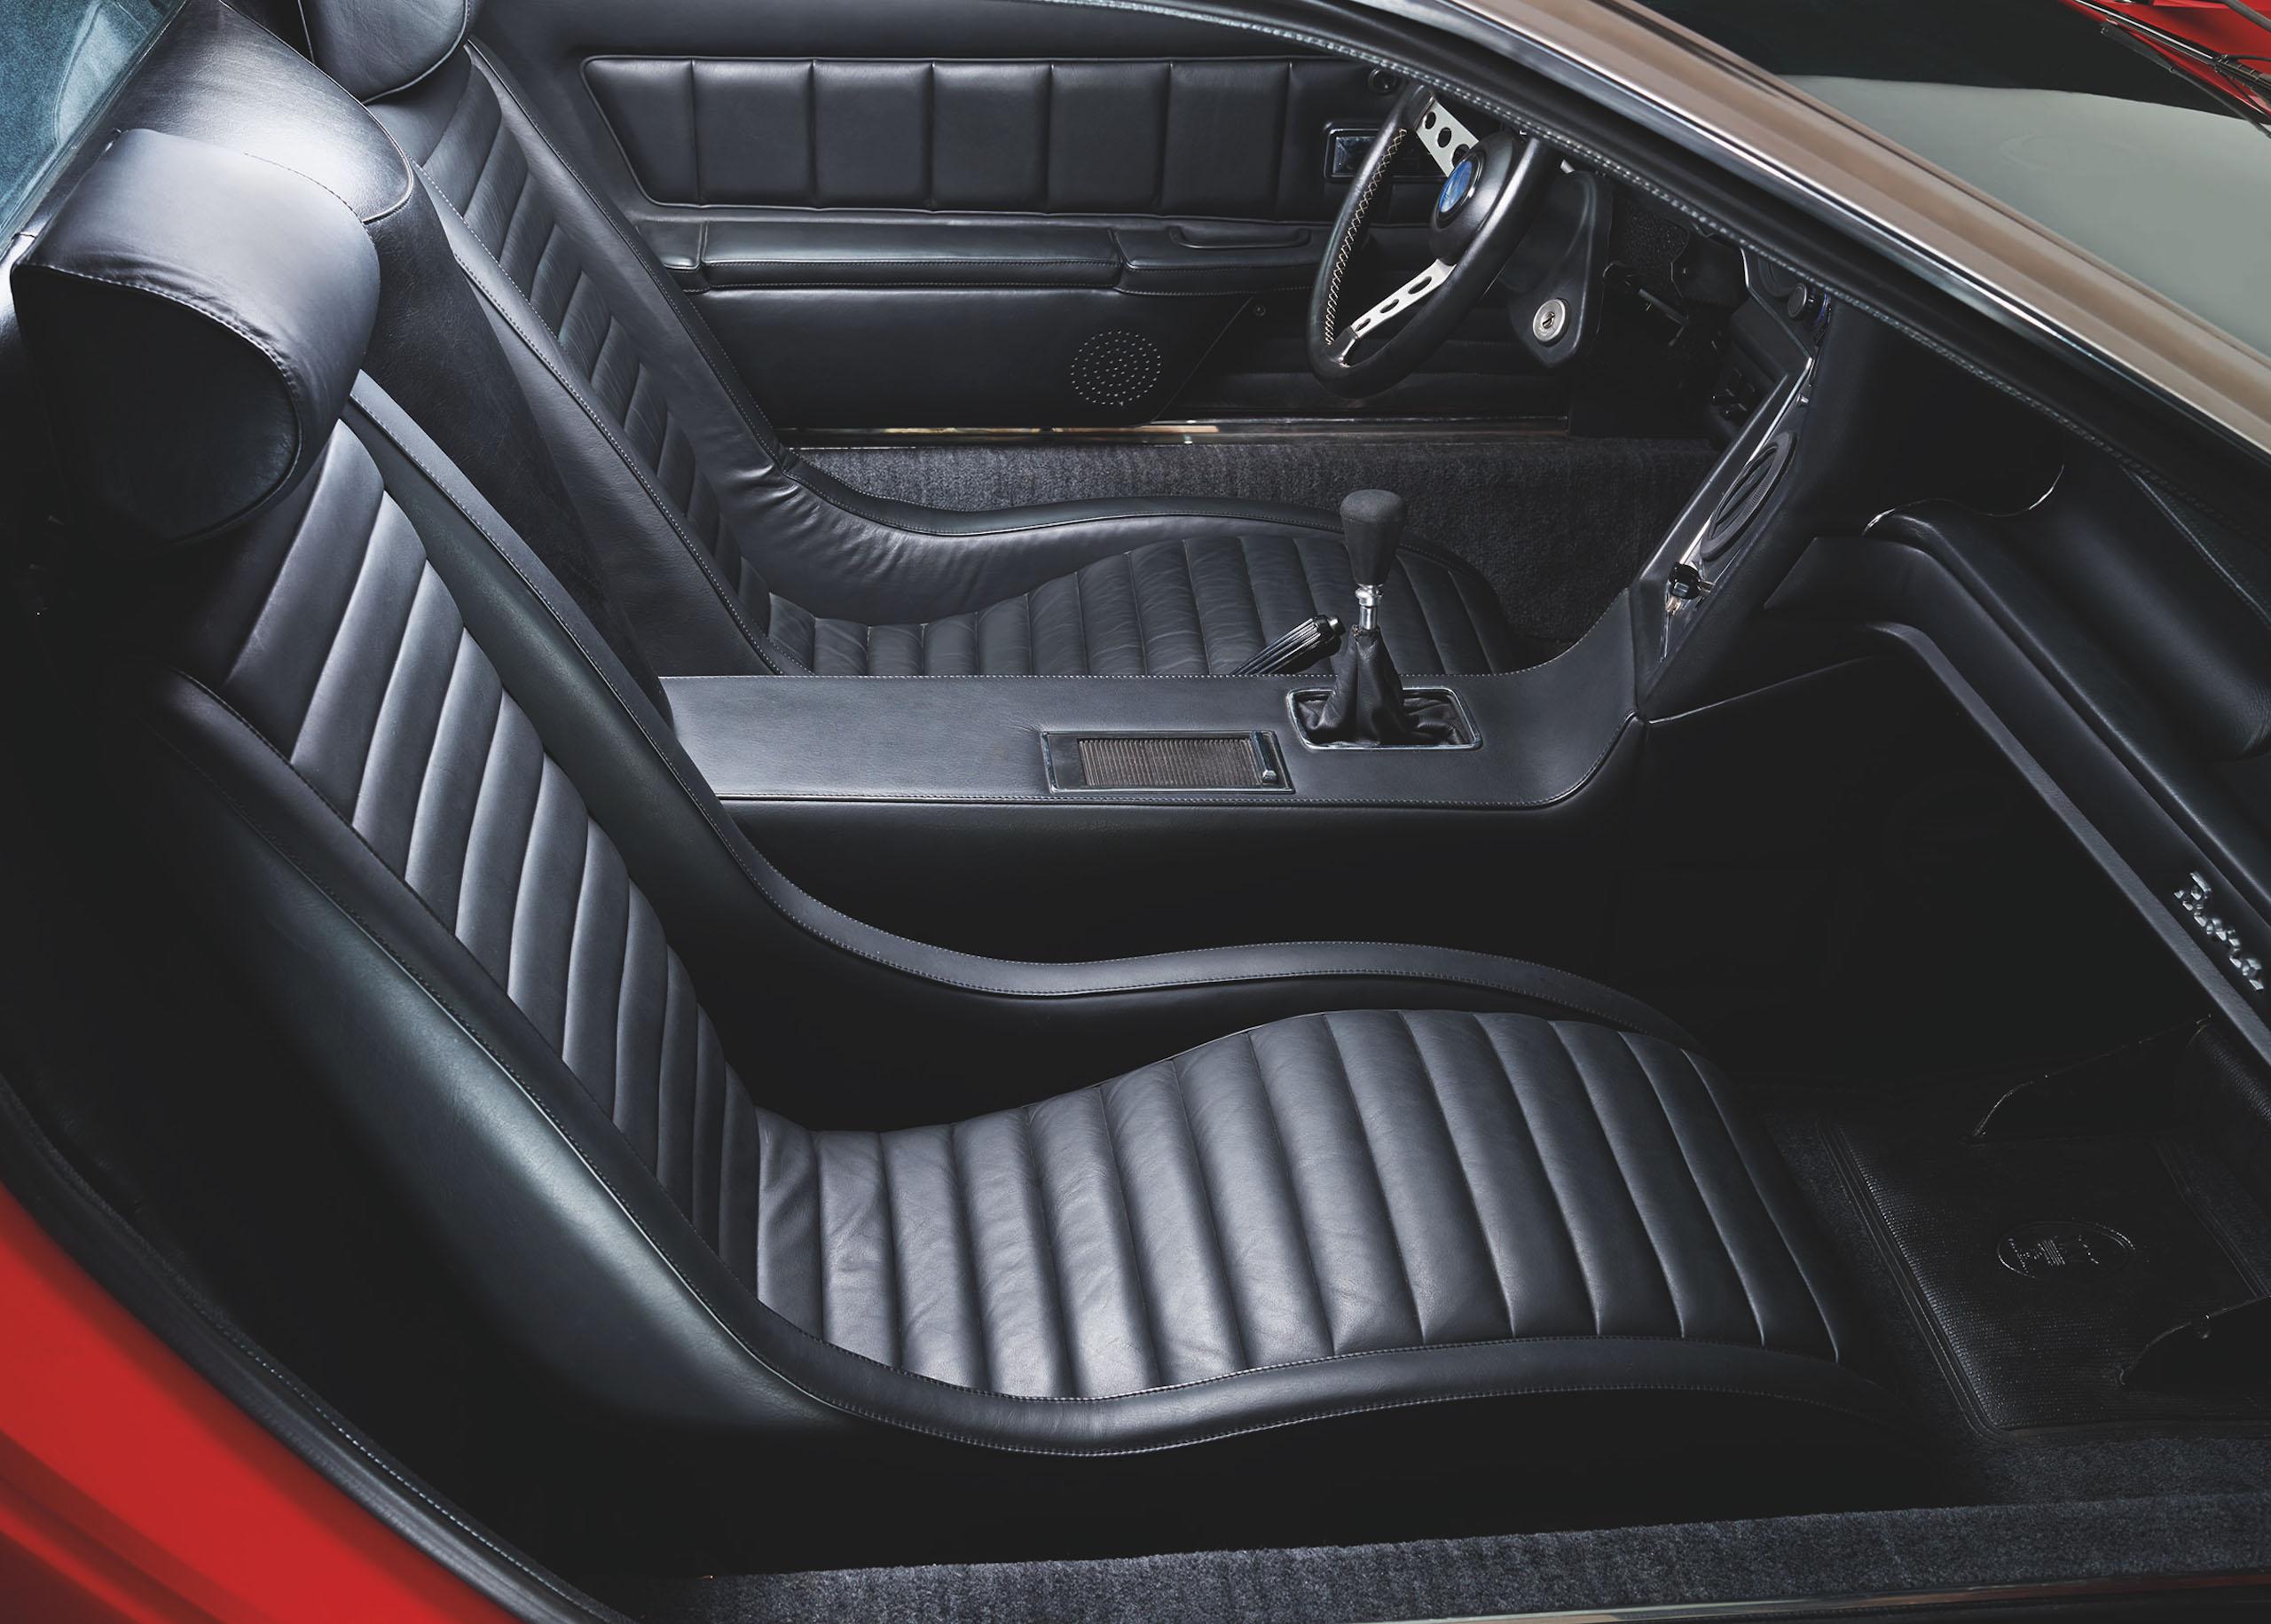 Maserati Bora interior passenger side